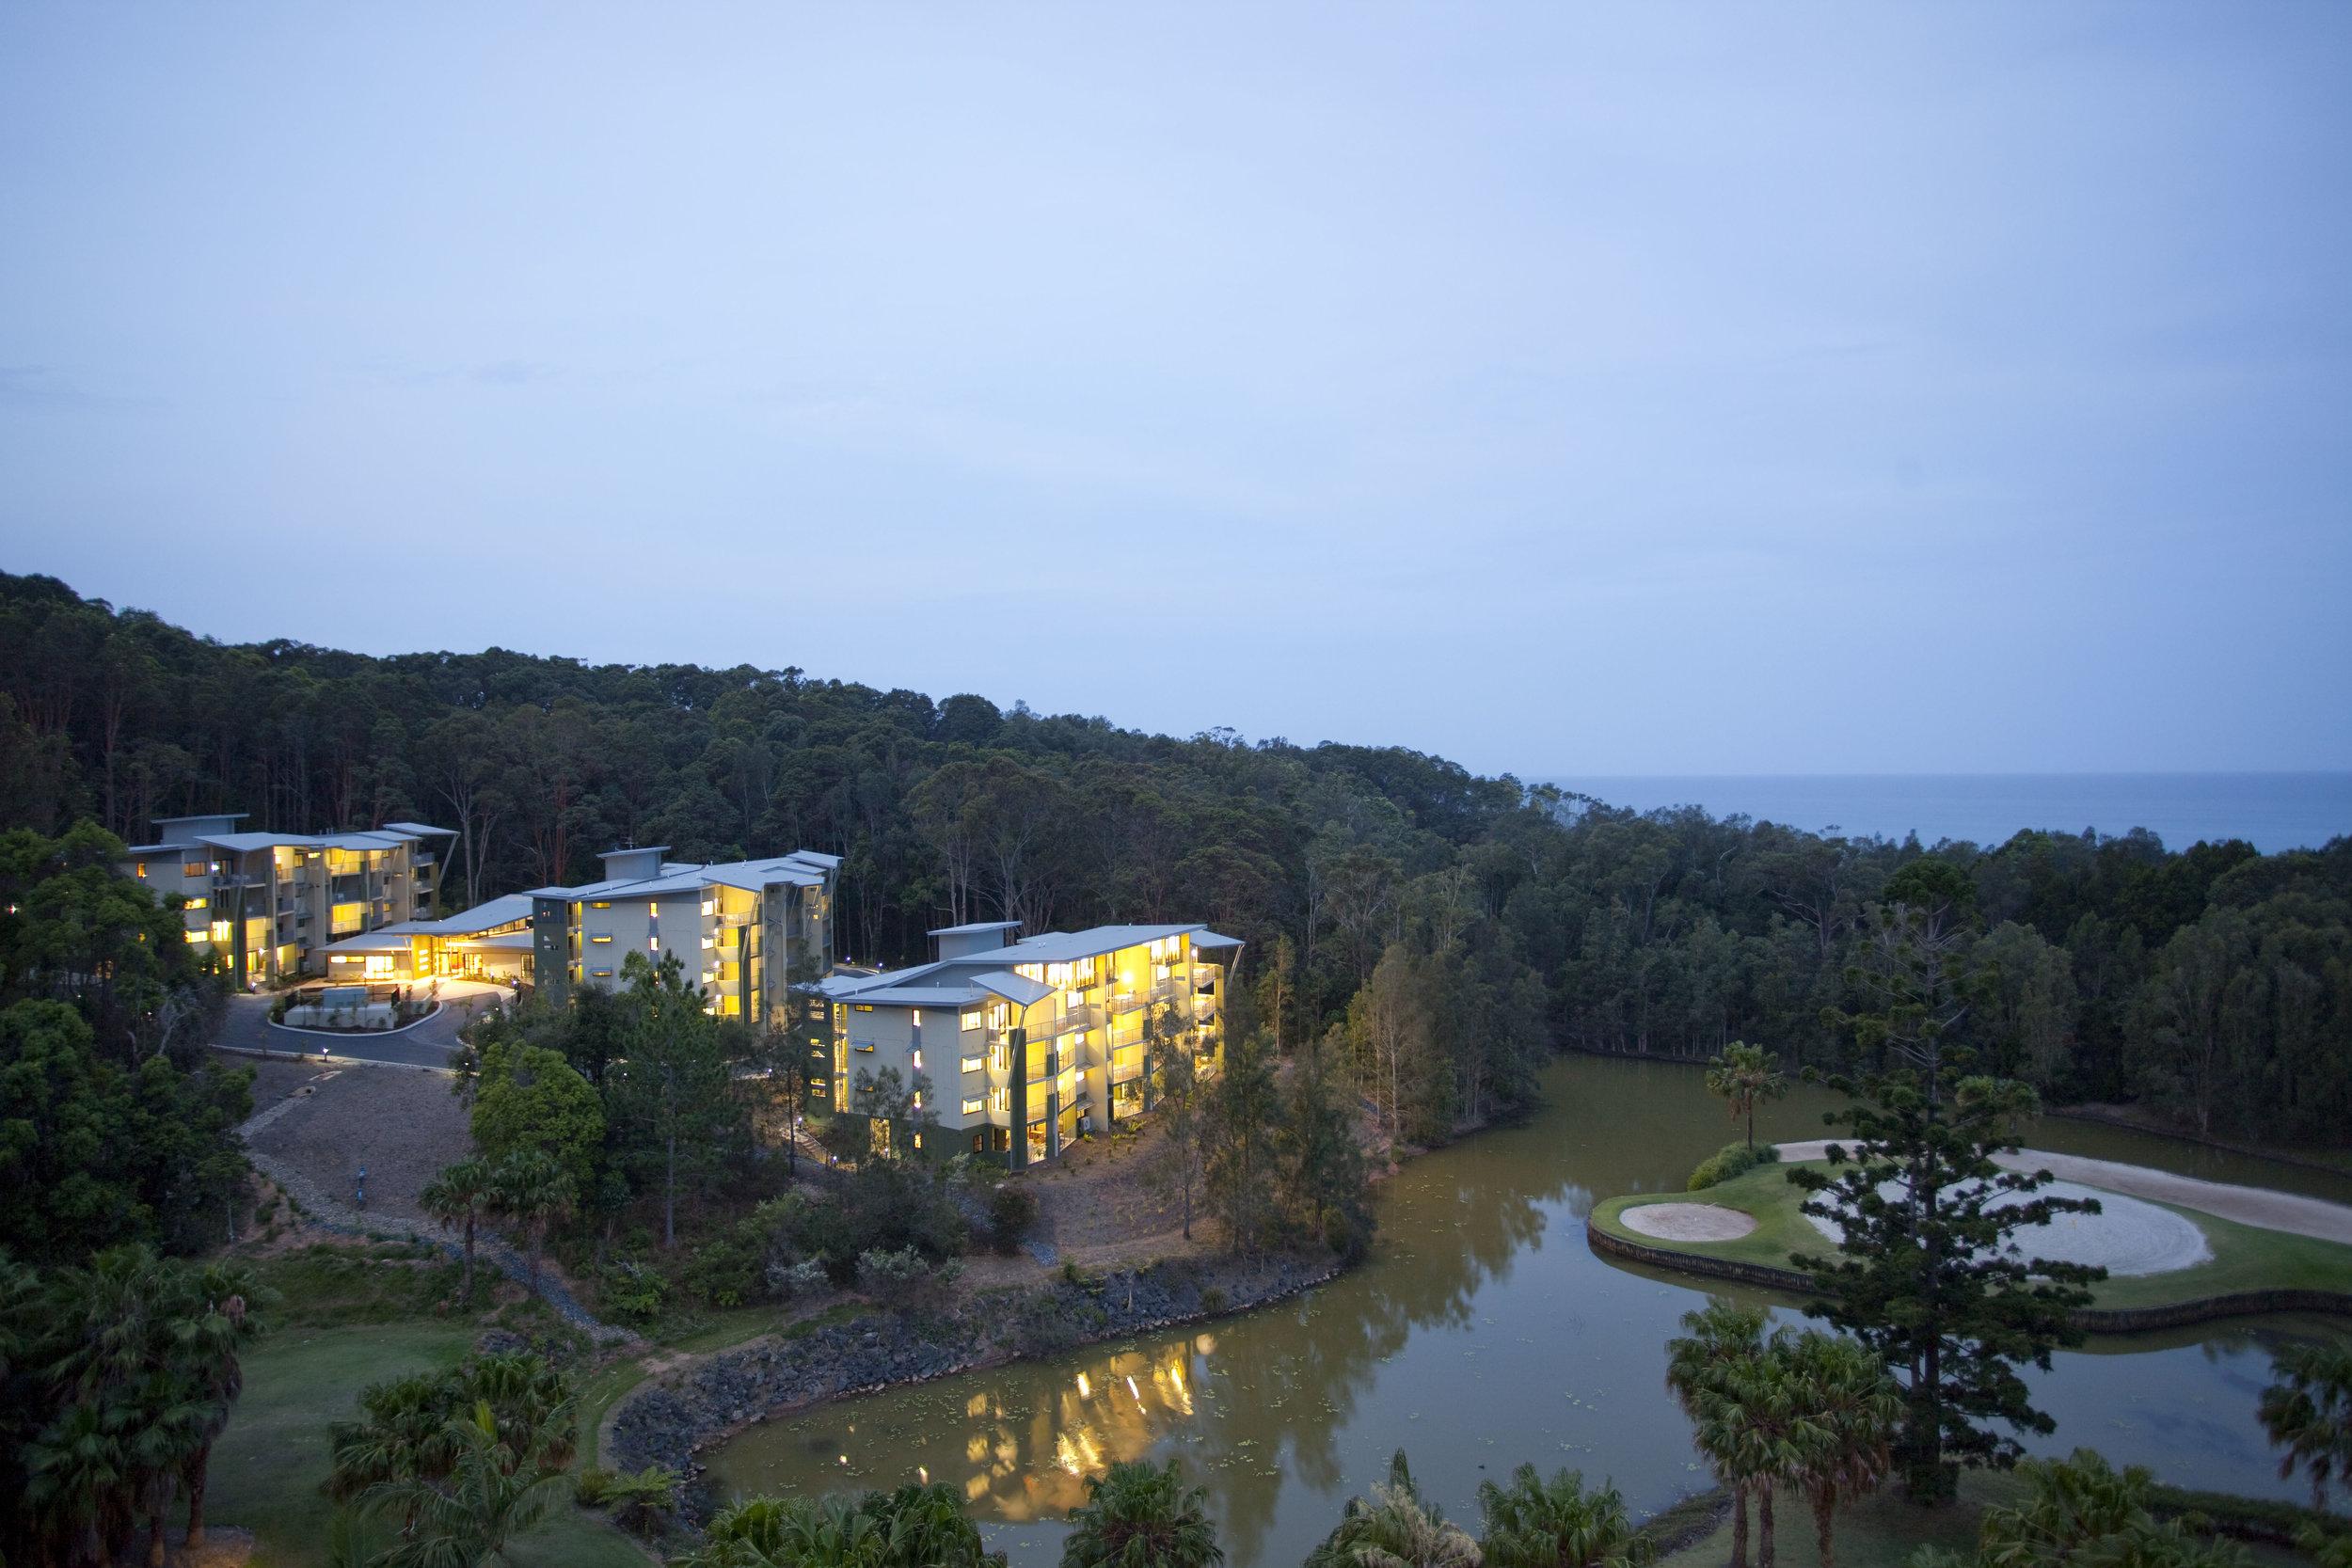 Tree-Tops-Pacific-Bay-Resort-guymer-bailey-10.jpg